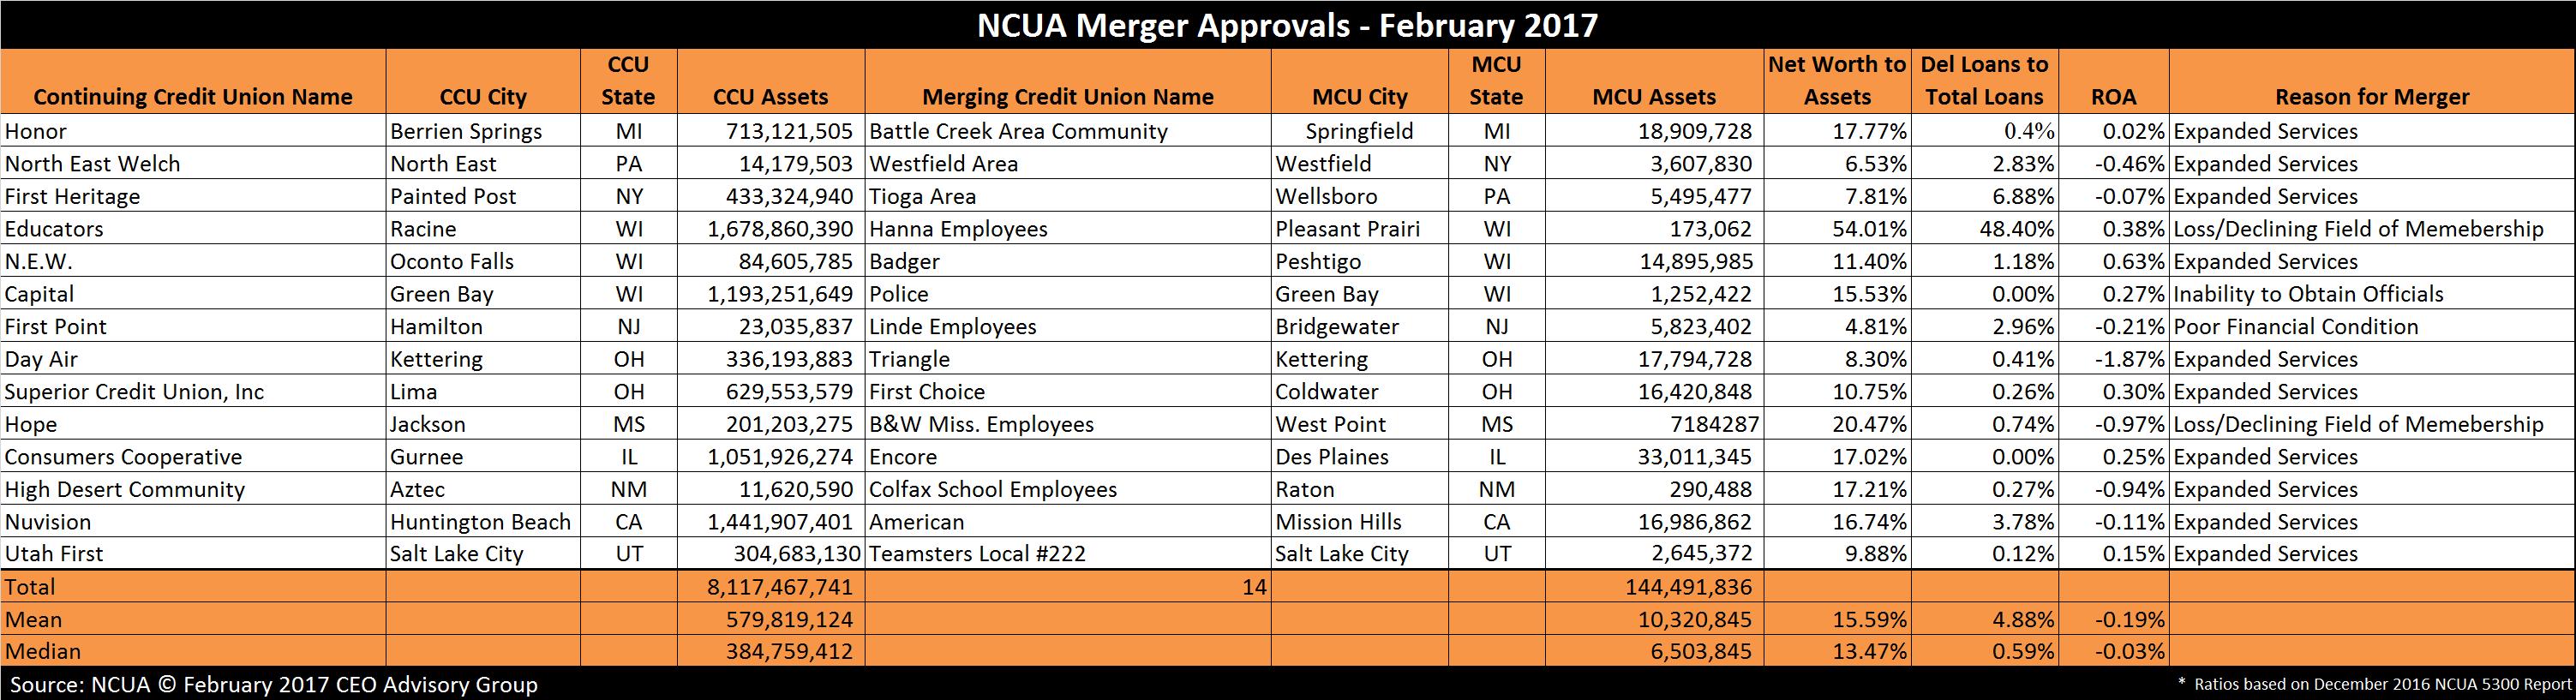 Credit Union Mergers - February 2017